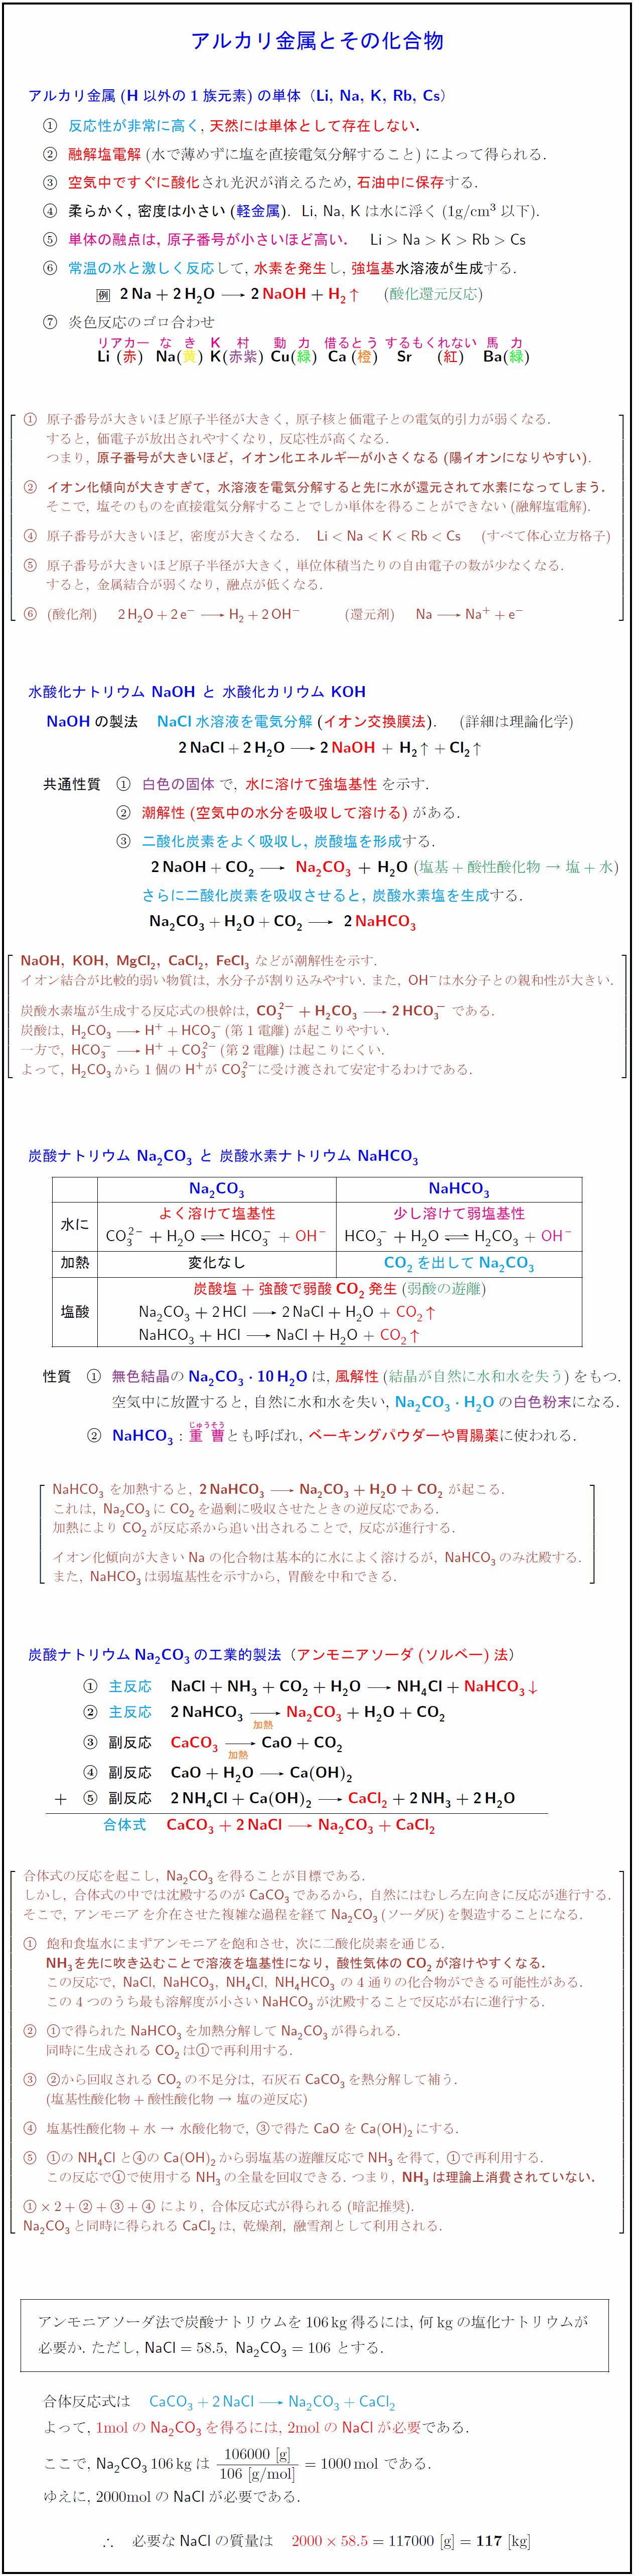 alkali-metal